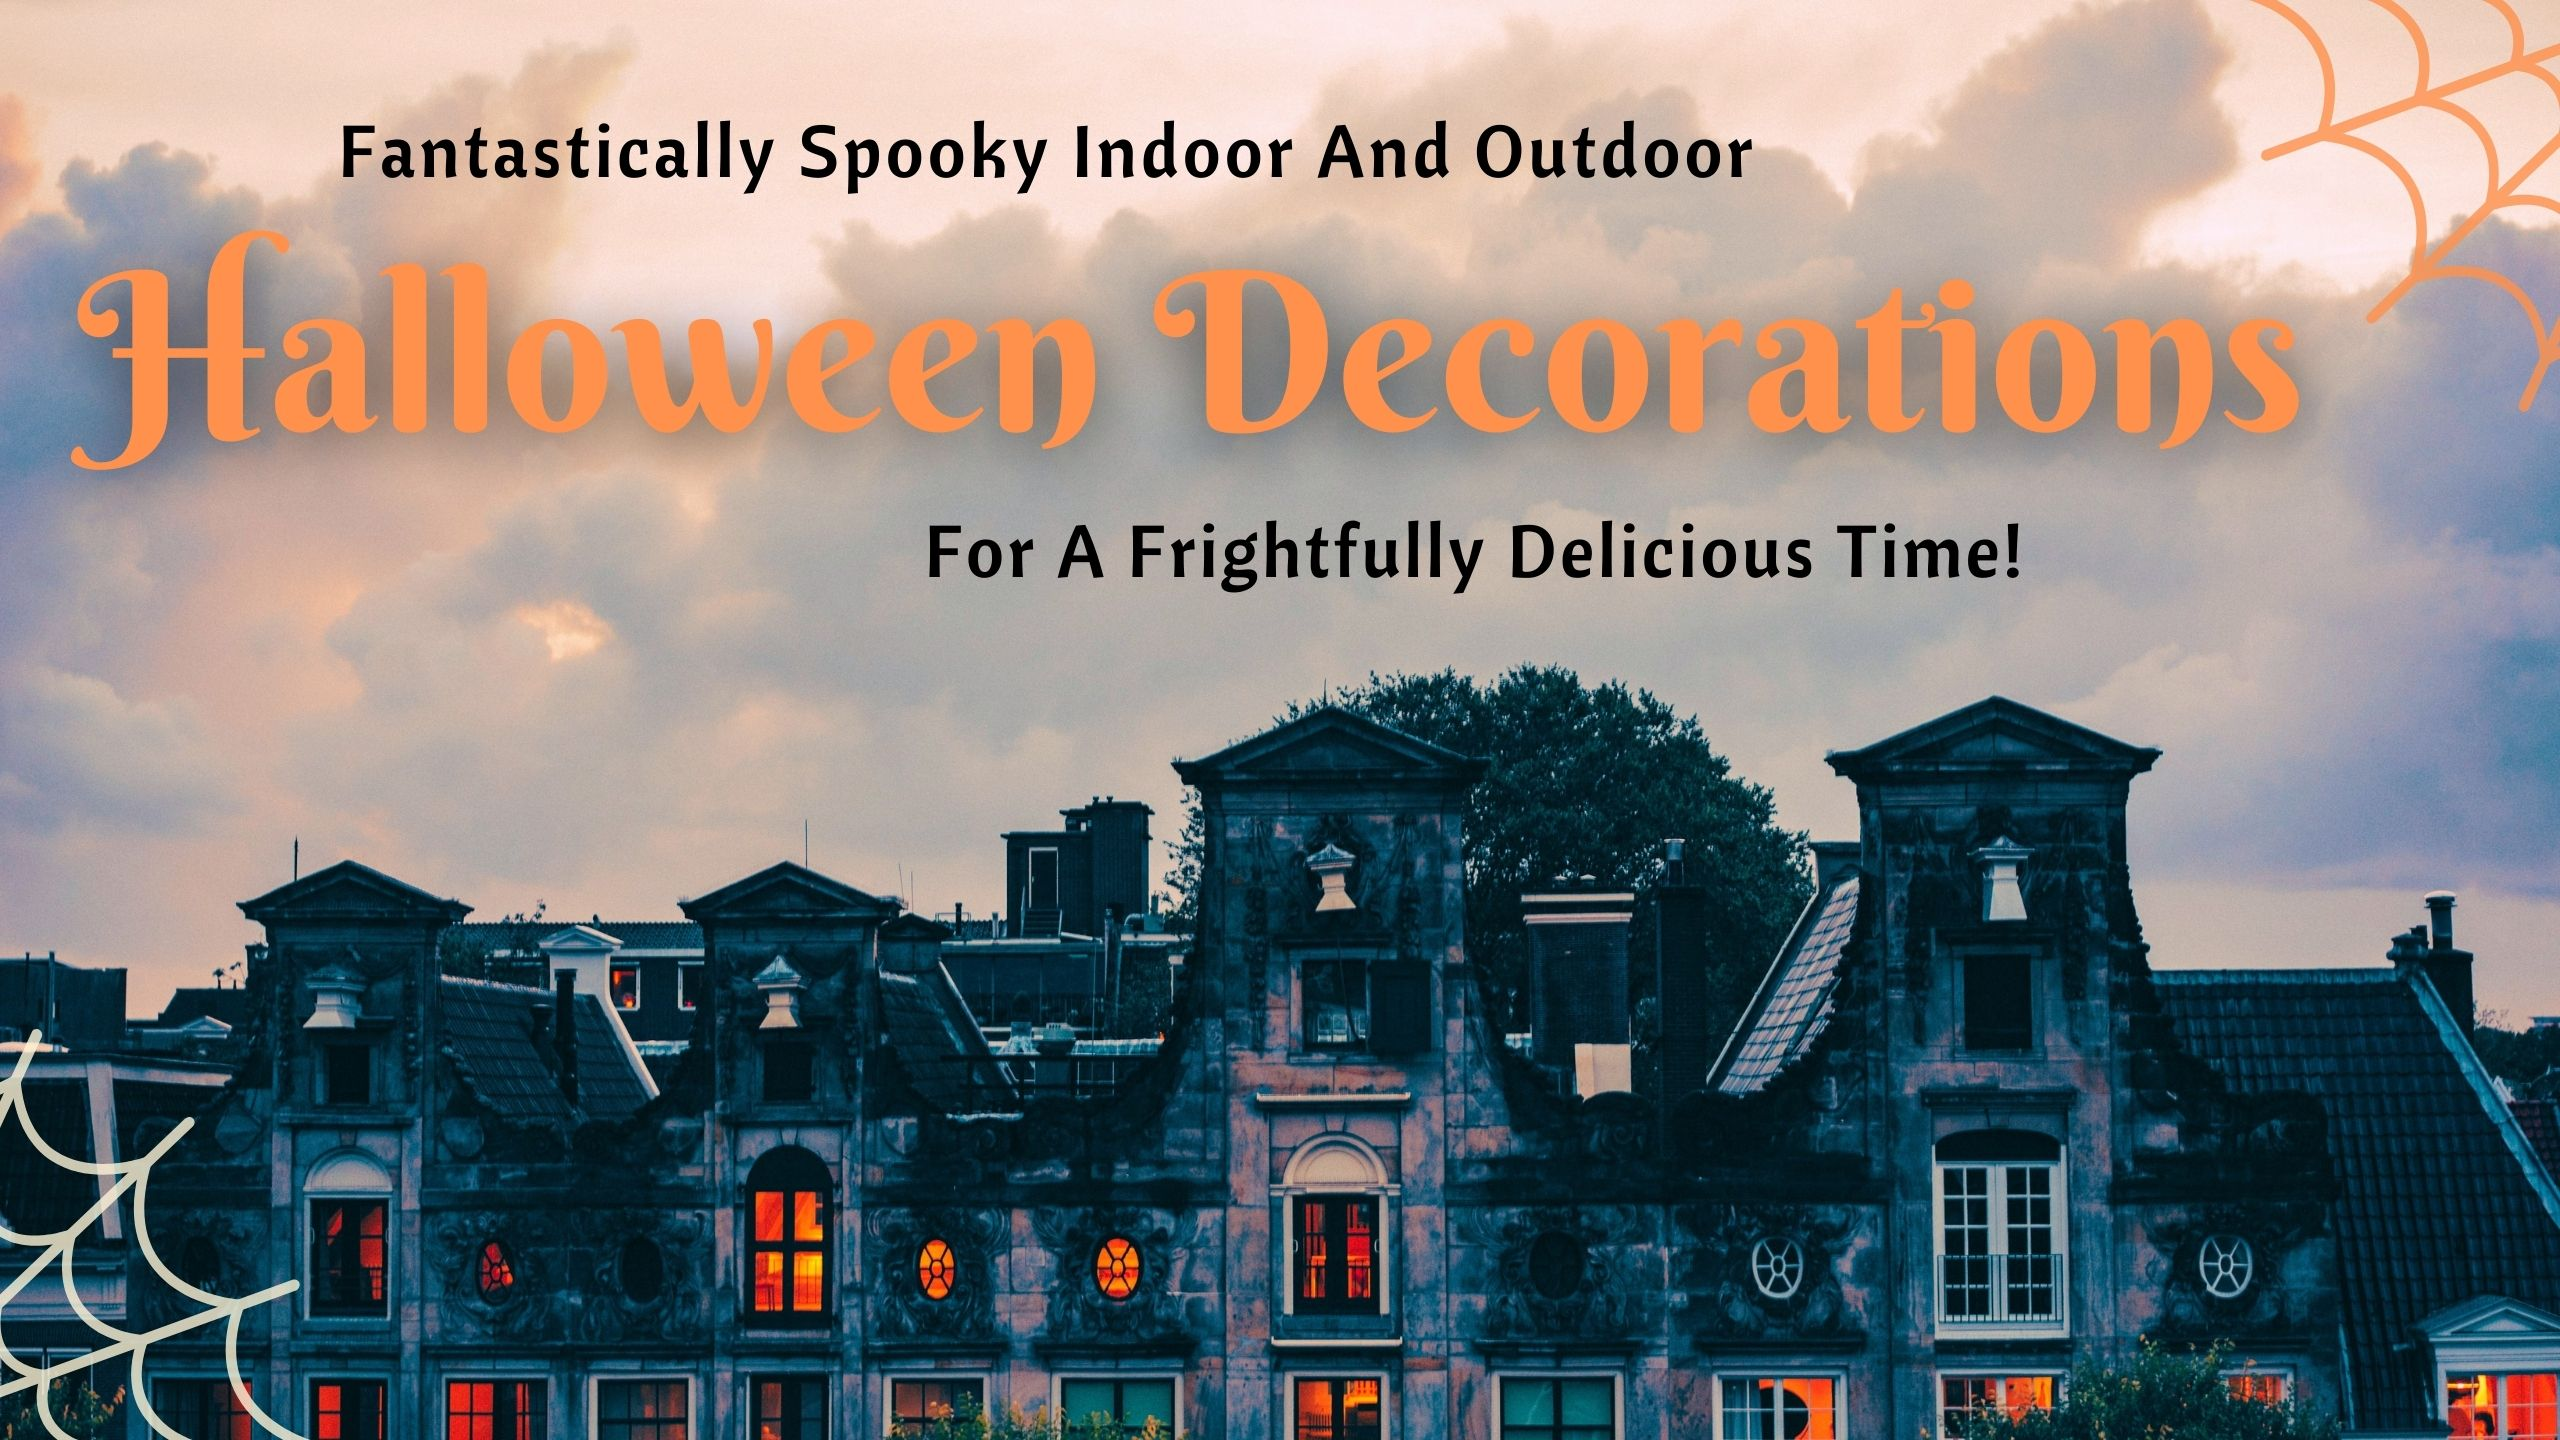 Fantastically Spooky Indoor And Outdoor Halloween Decorations Header